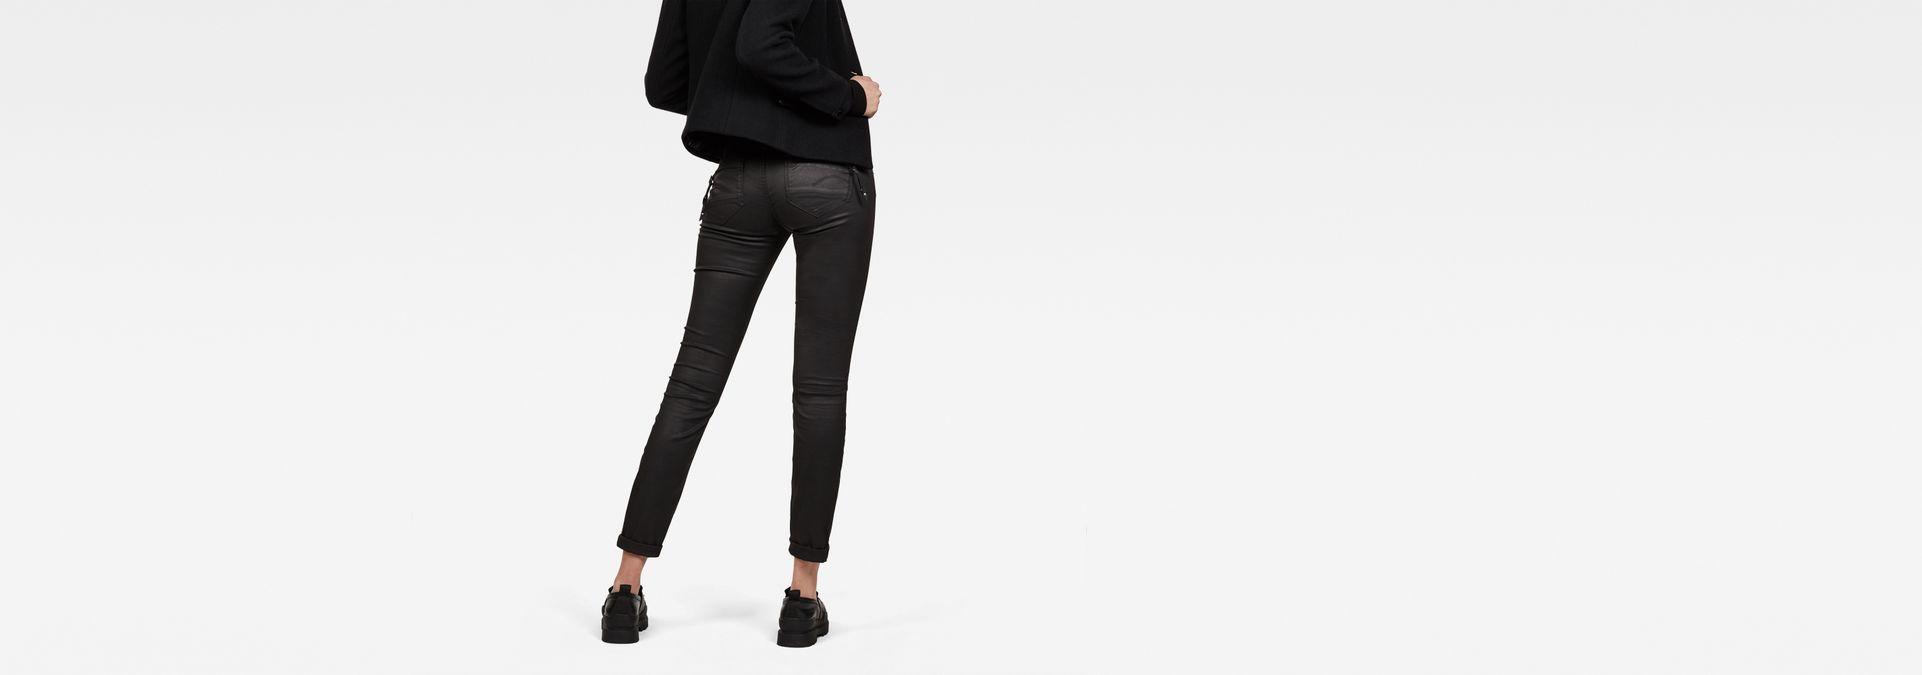 5eec01b3f Midge Cody Mid Skinny Jeans | Rinsed | Femmes | G-Star RAW®